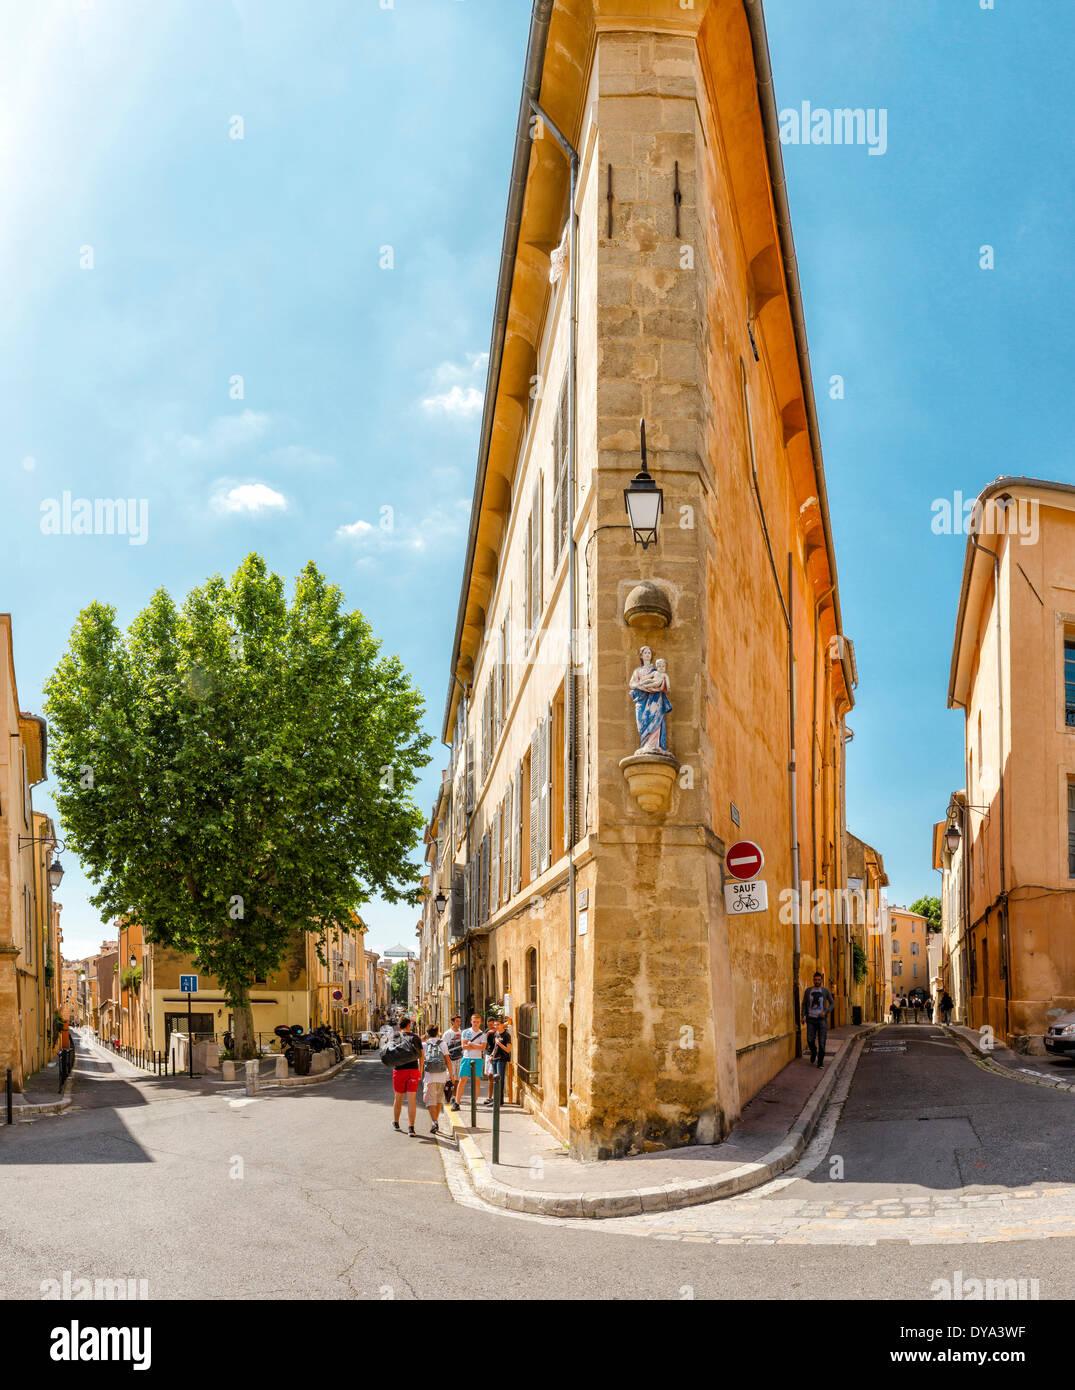 Place Miollis, town, village, summer, people, Aix en Provence, Bouches du Rhone, France, Europe, building, architecture - Stock Image